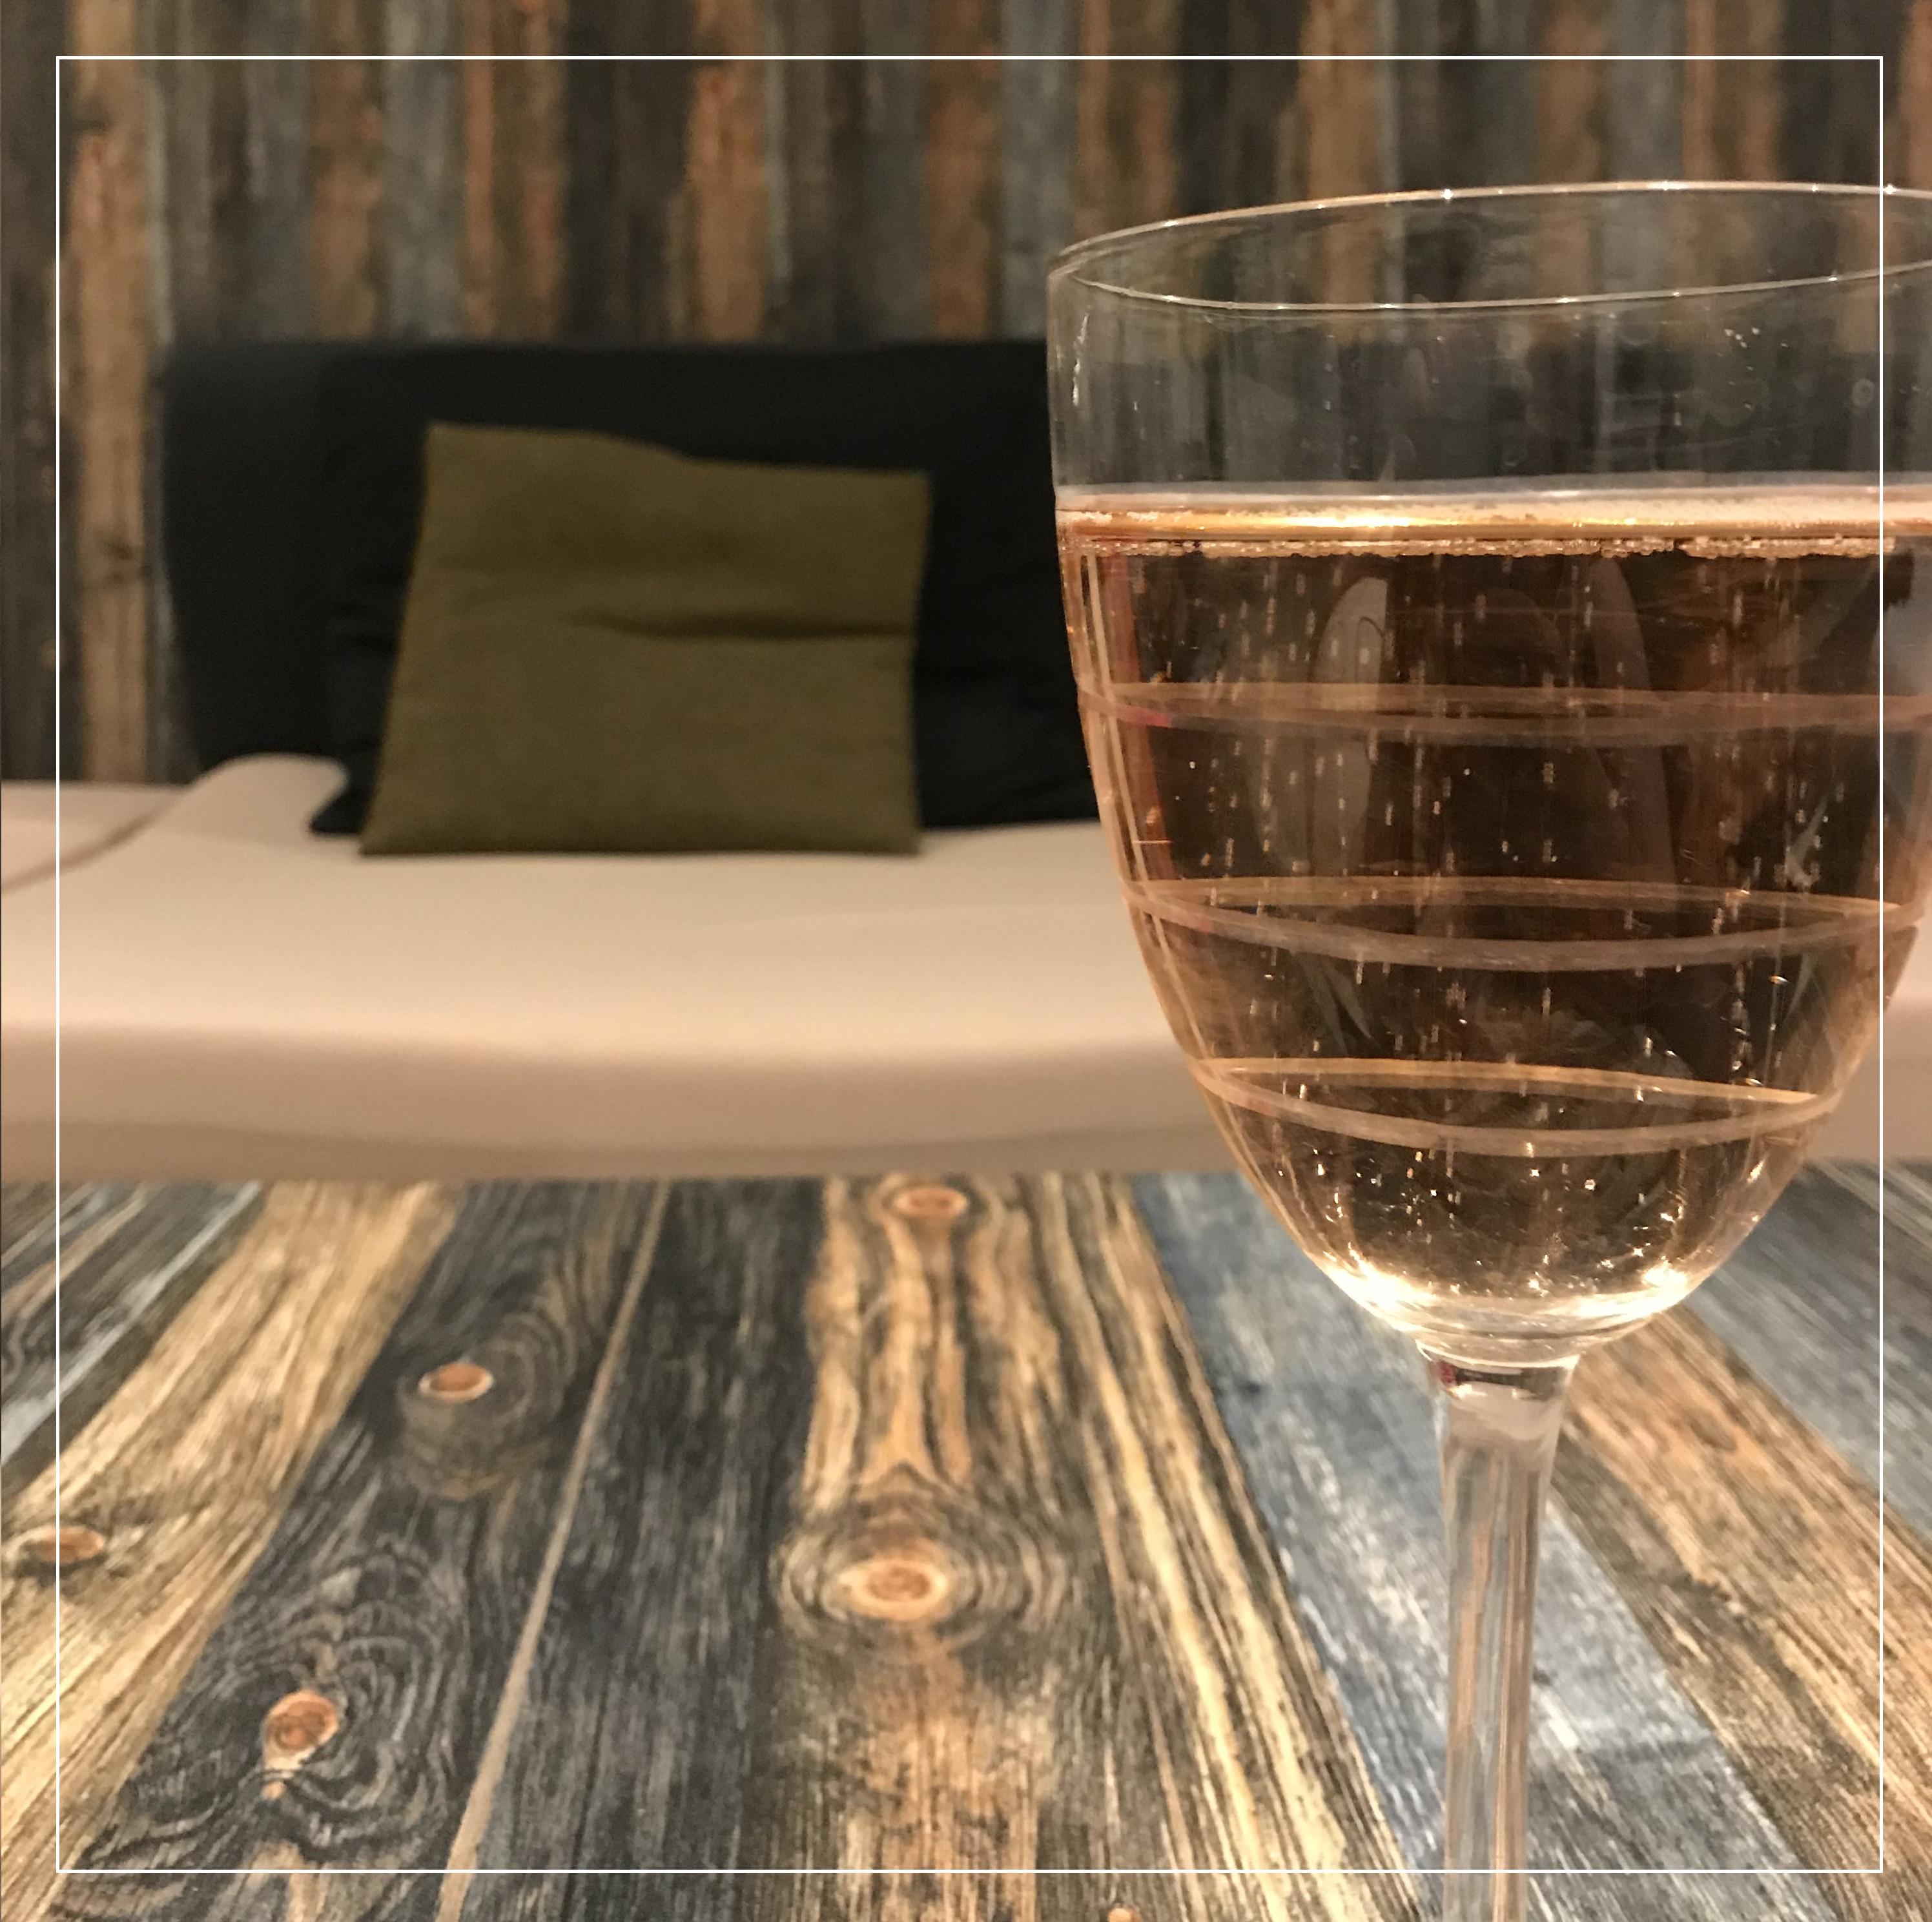 champagne_1ajpg